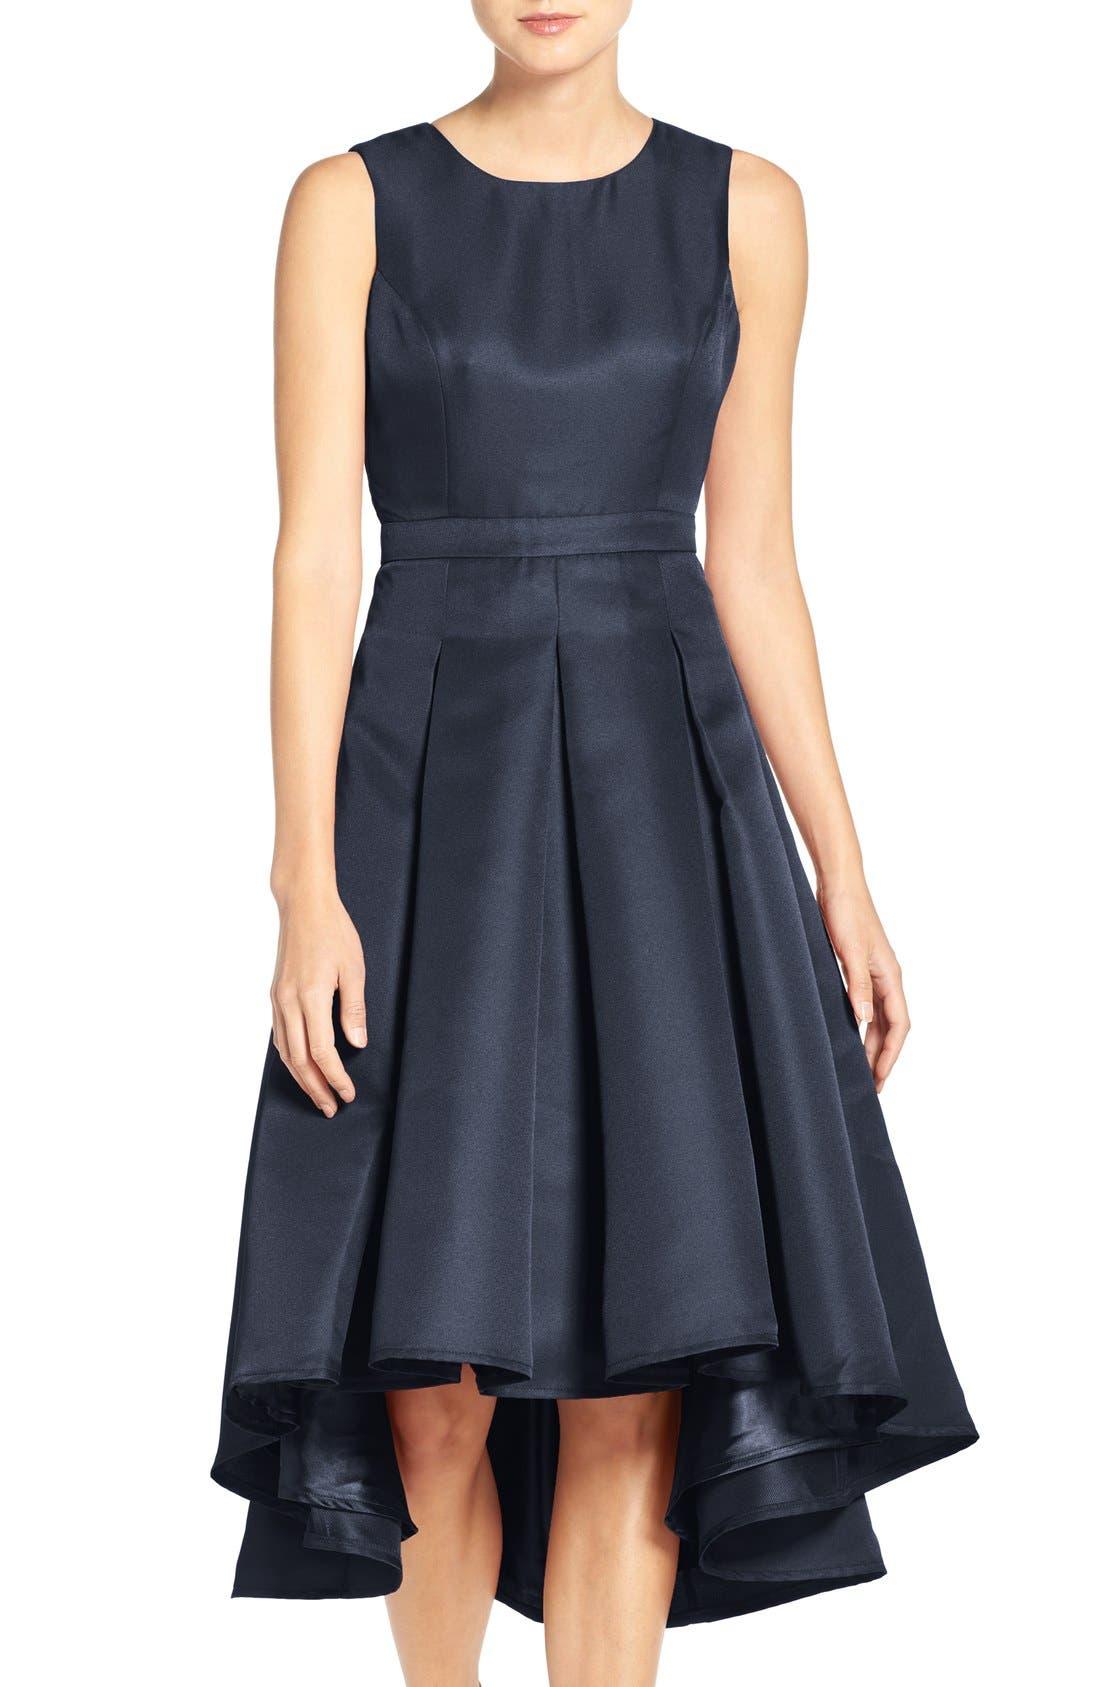 LULUS Cutout Back Tea Length High/Low Dress